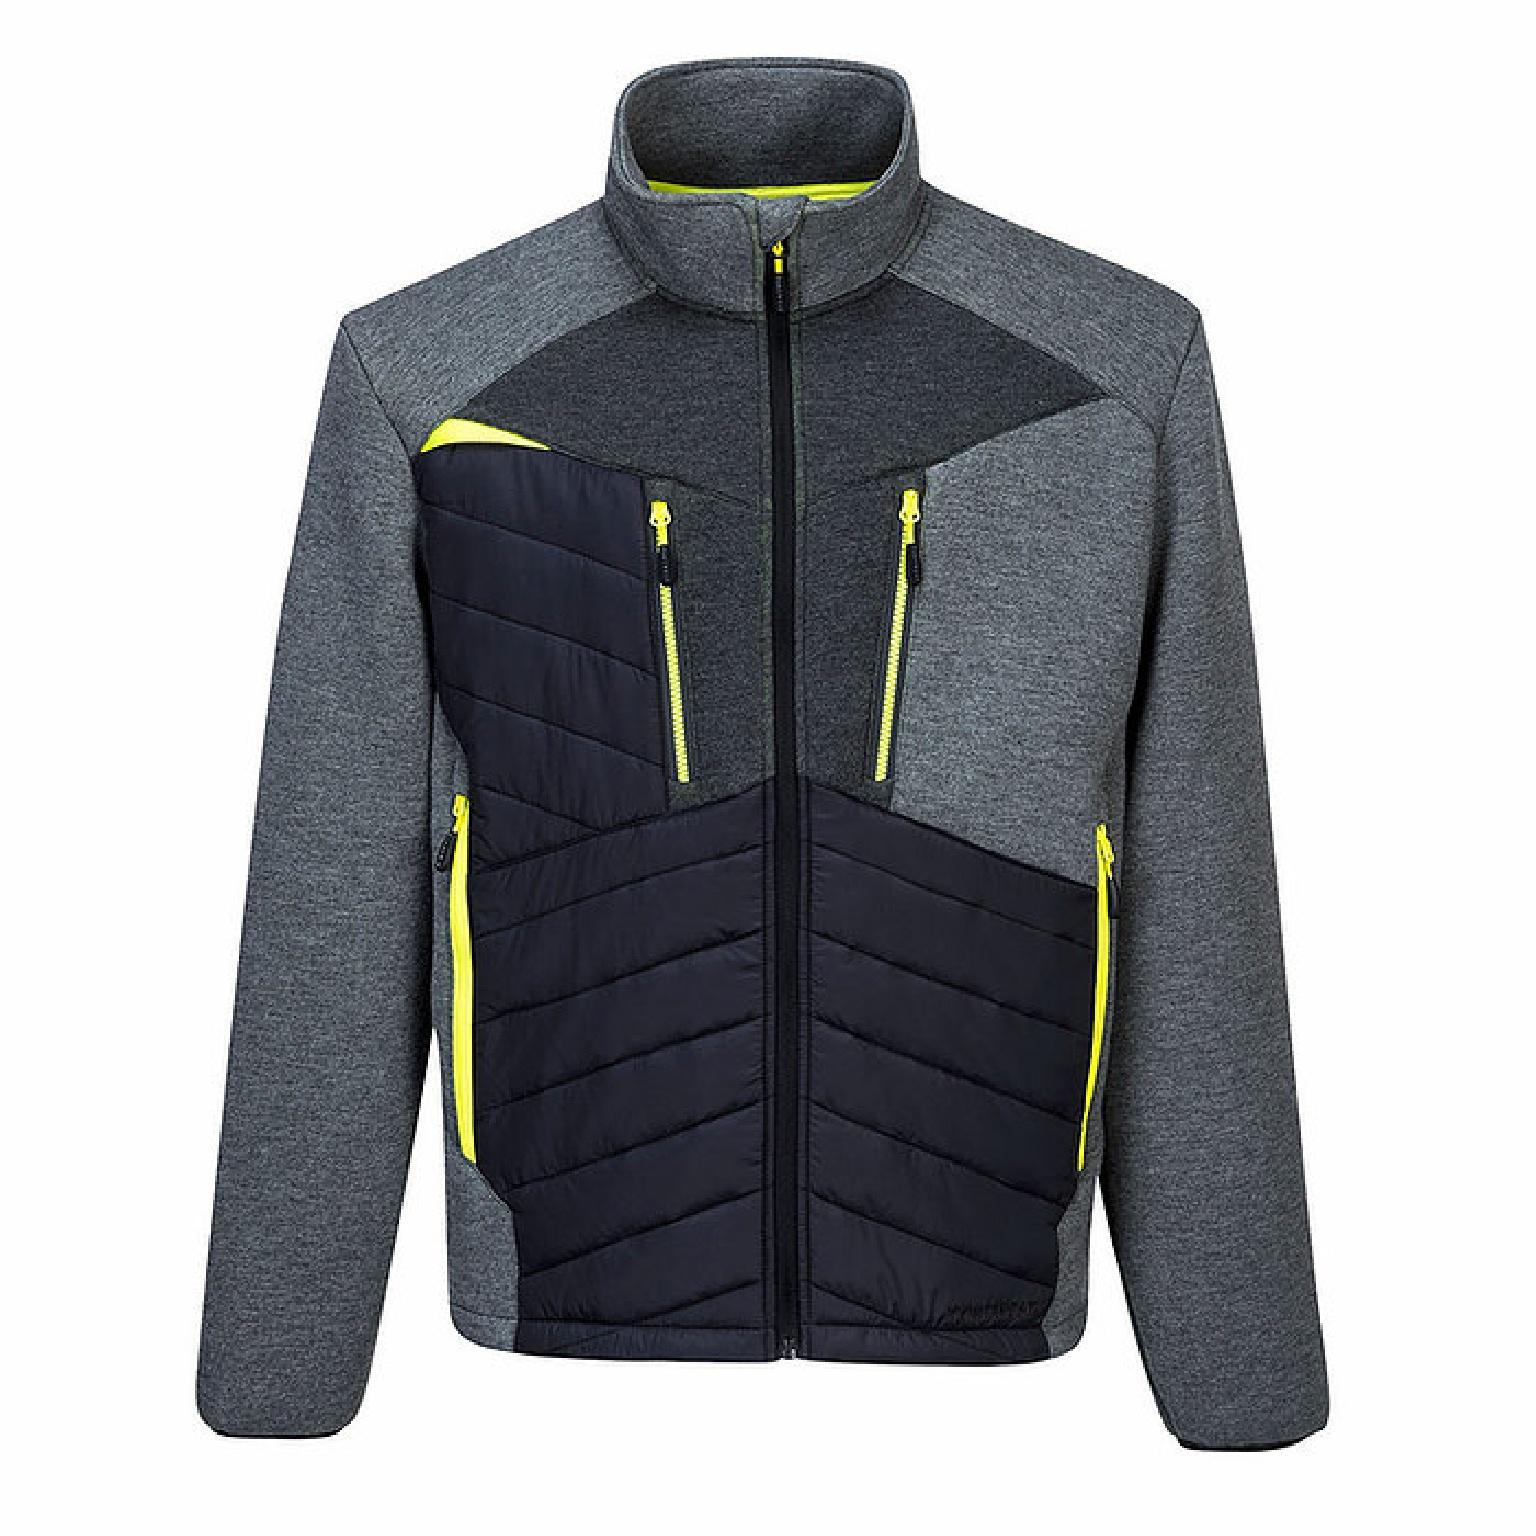 Redrok Workwear Centre Plymouth - DX4 Baffle Jacket - Grey